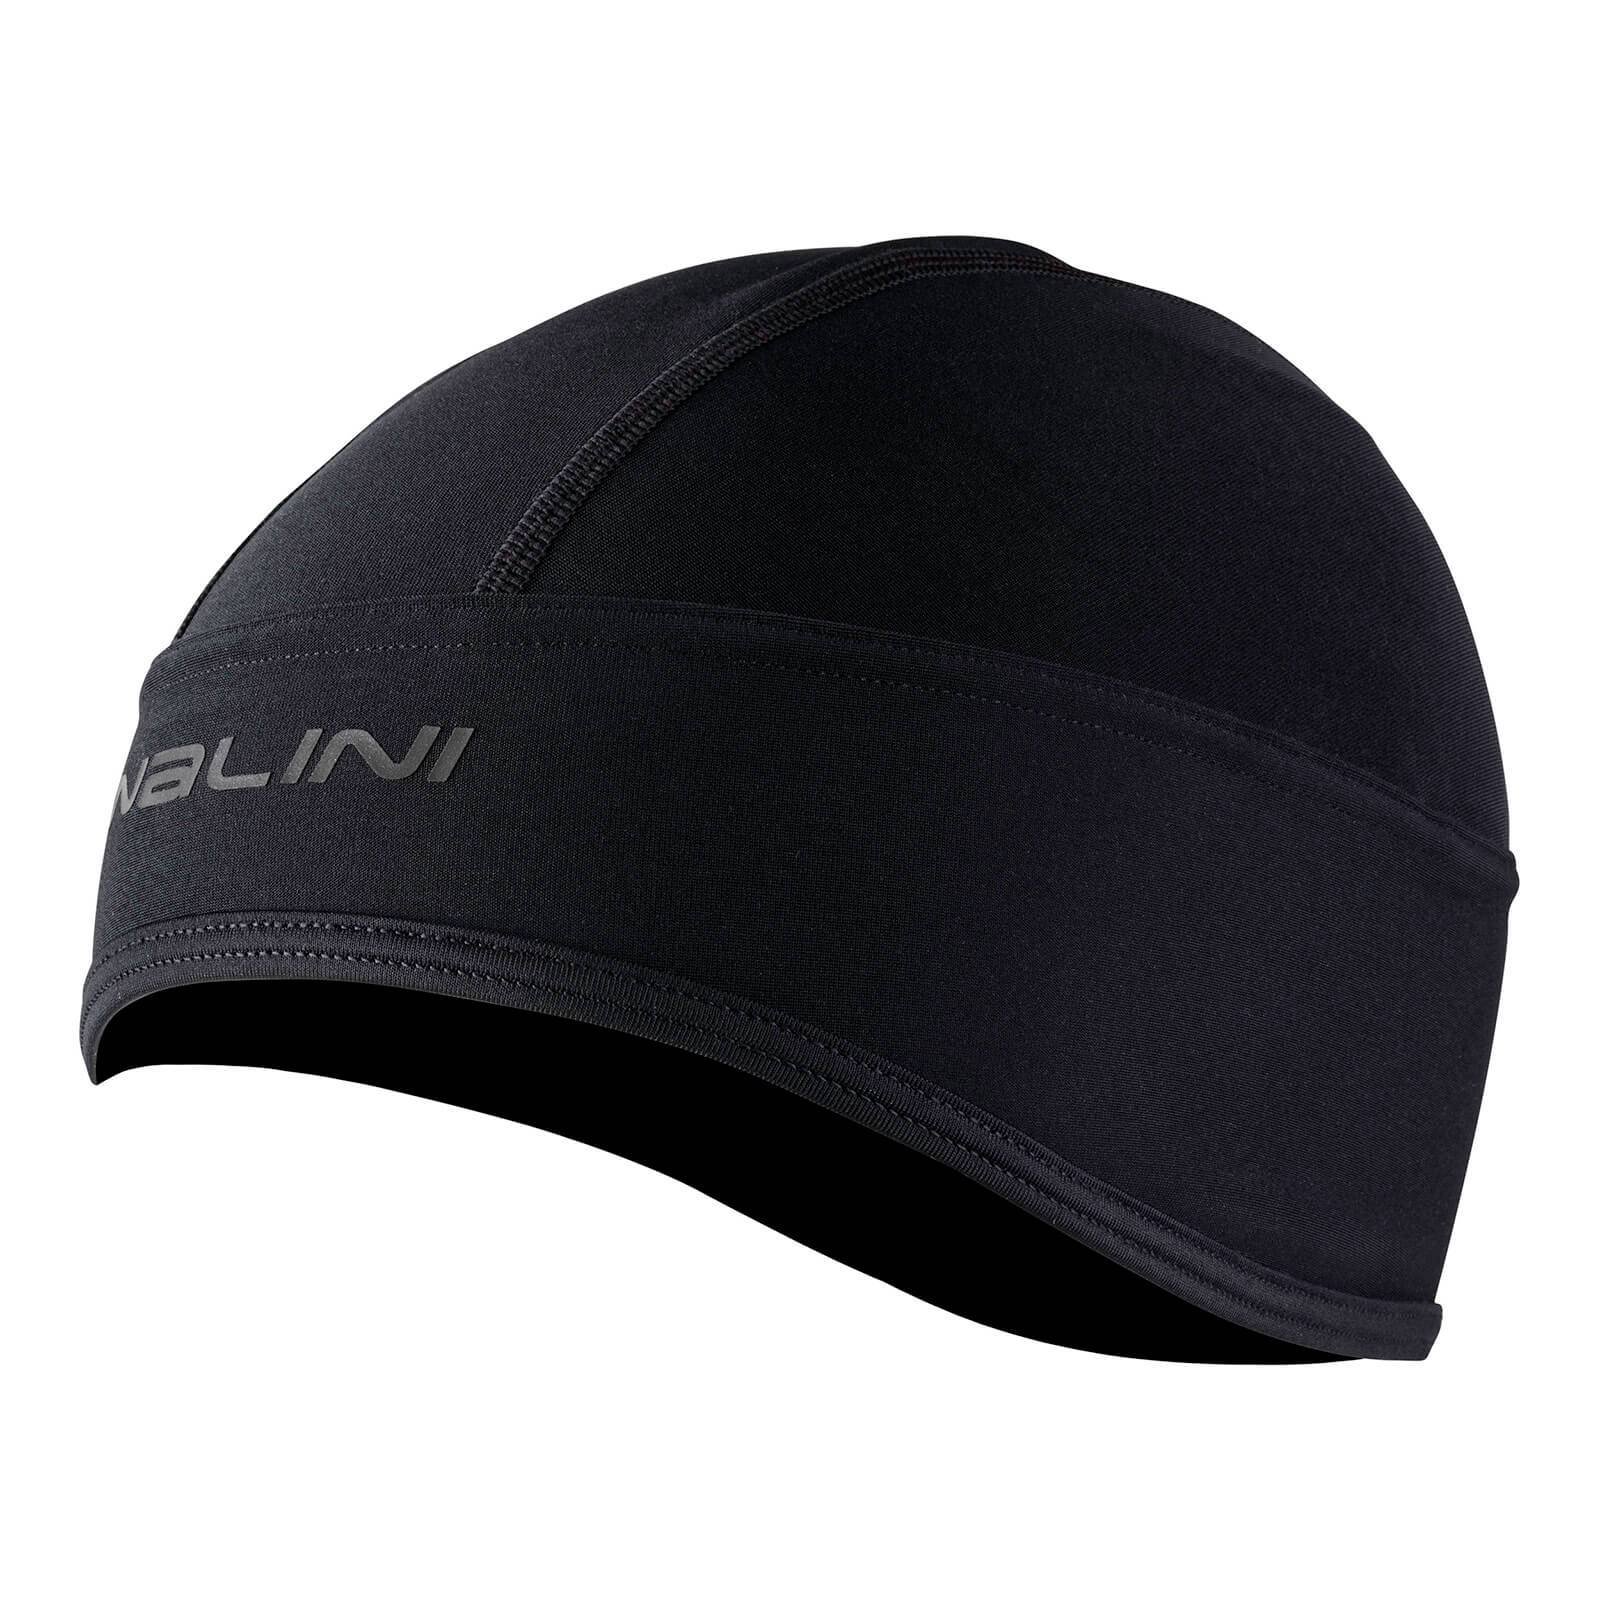 Nalini Nalini Winter Cap - XS/S - Black